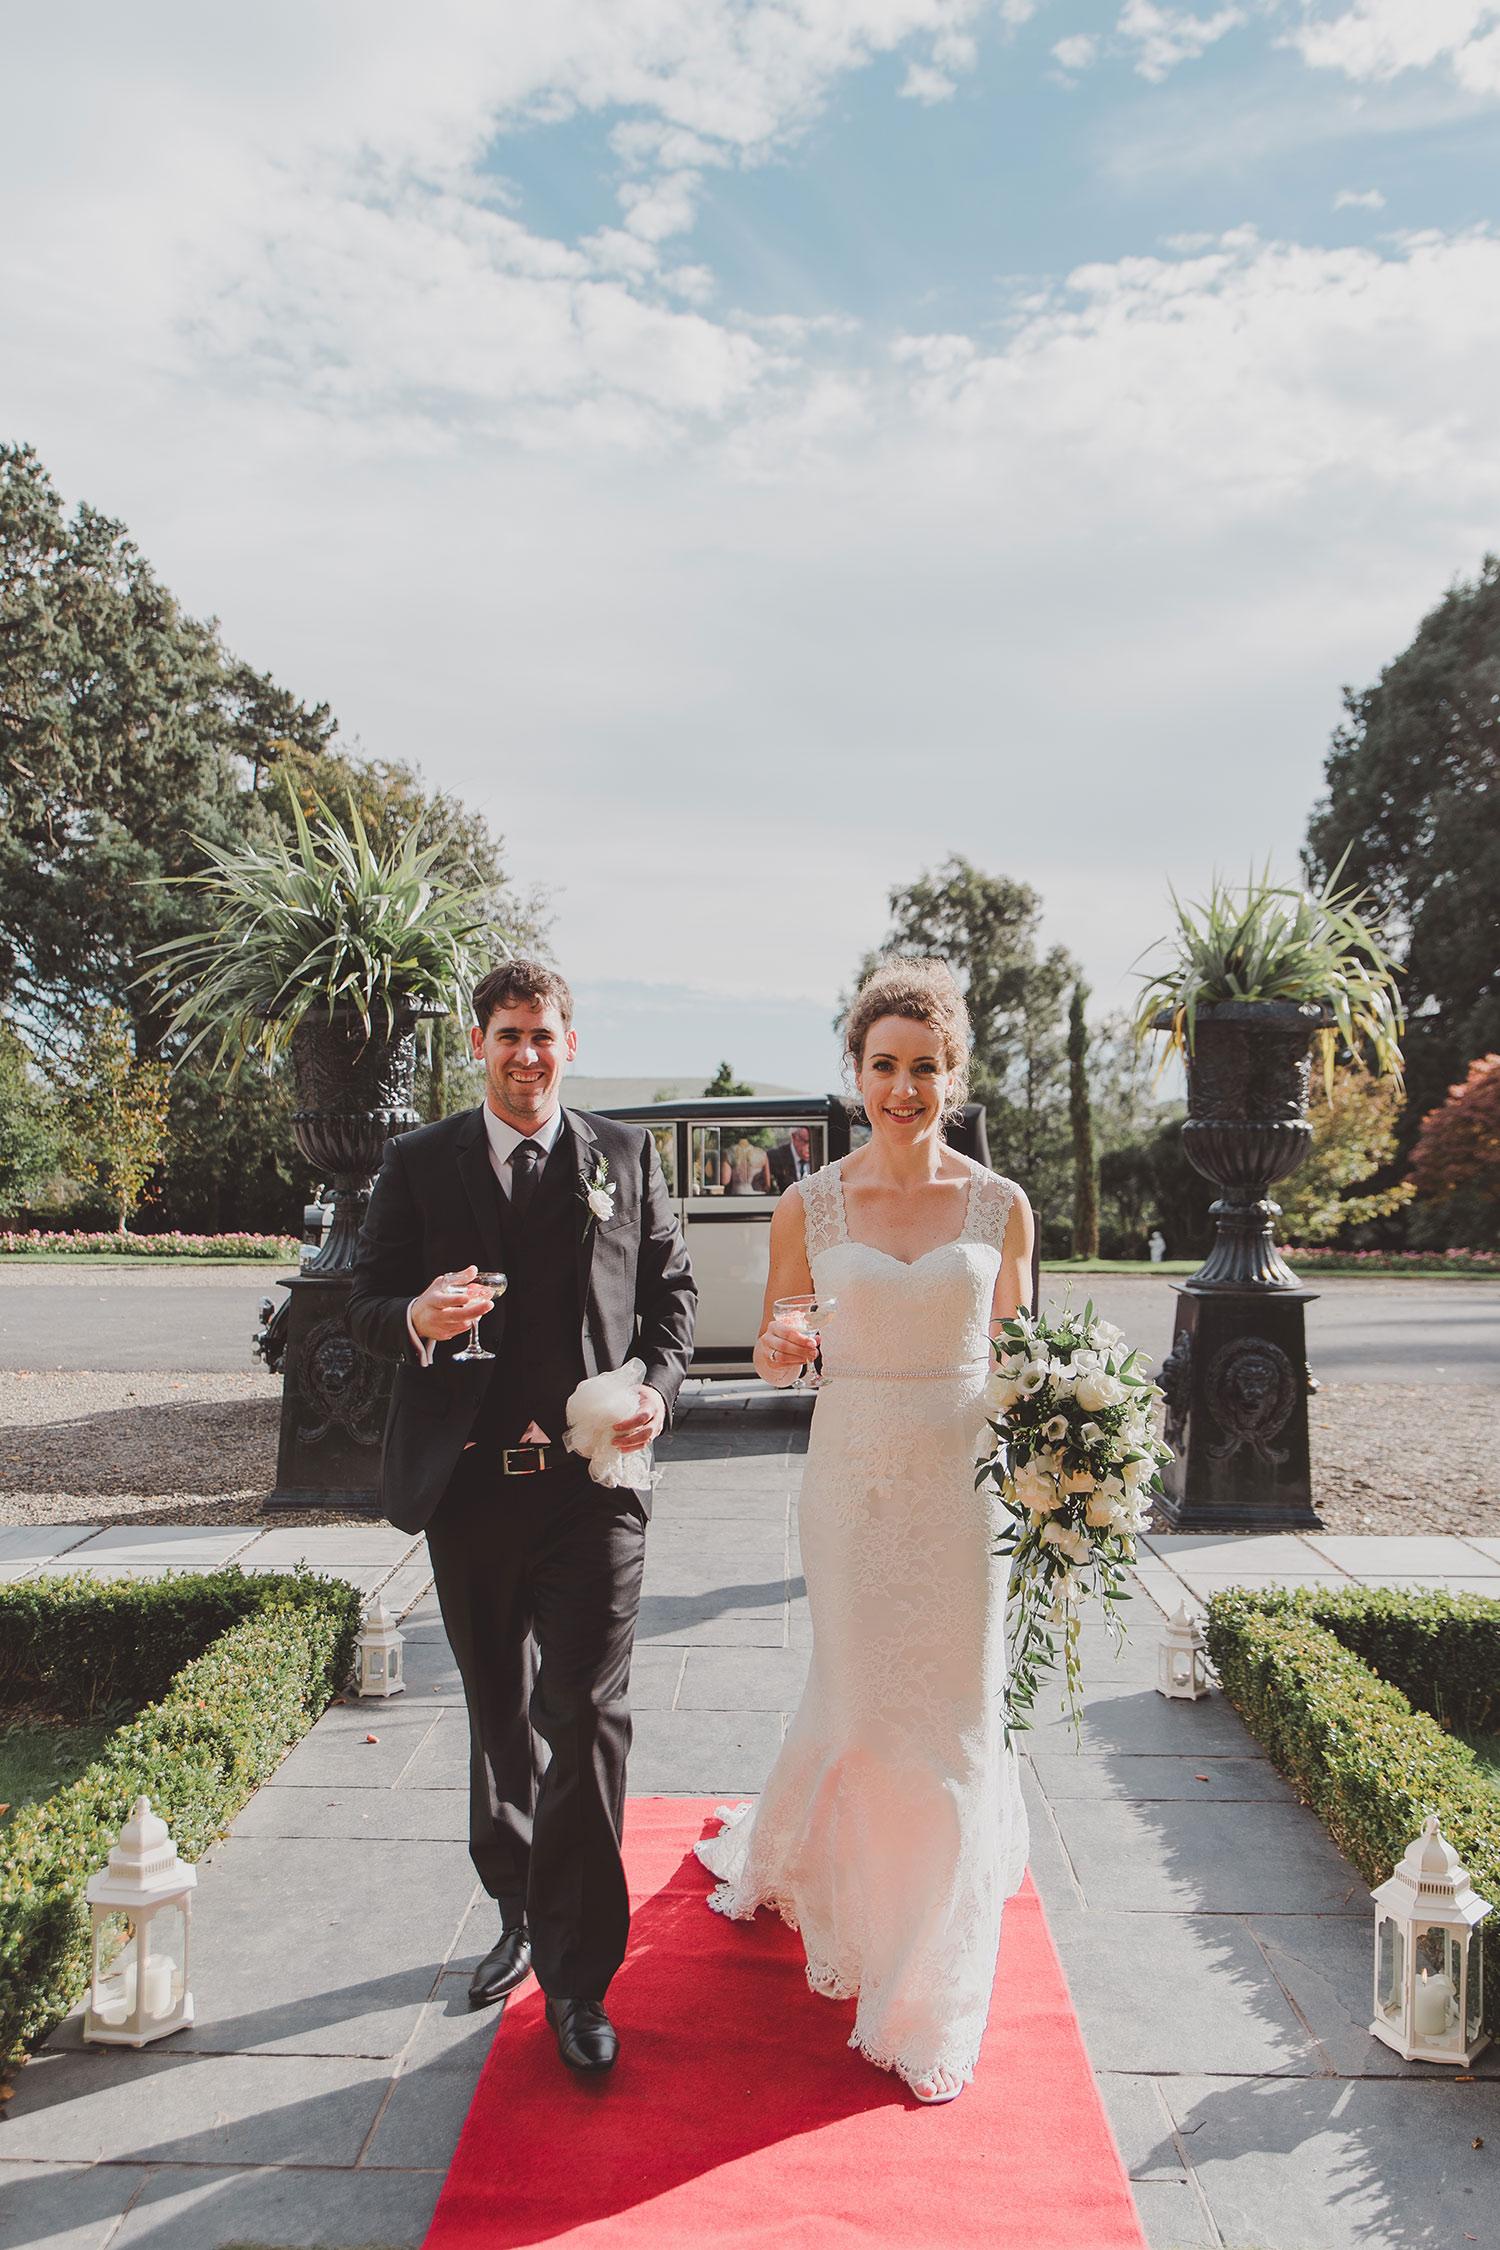 tinakilly-house-wedding-photographer084.jpg